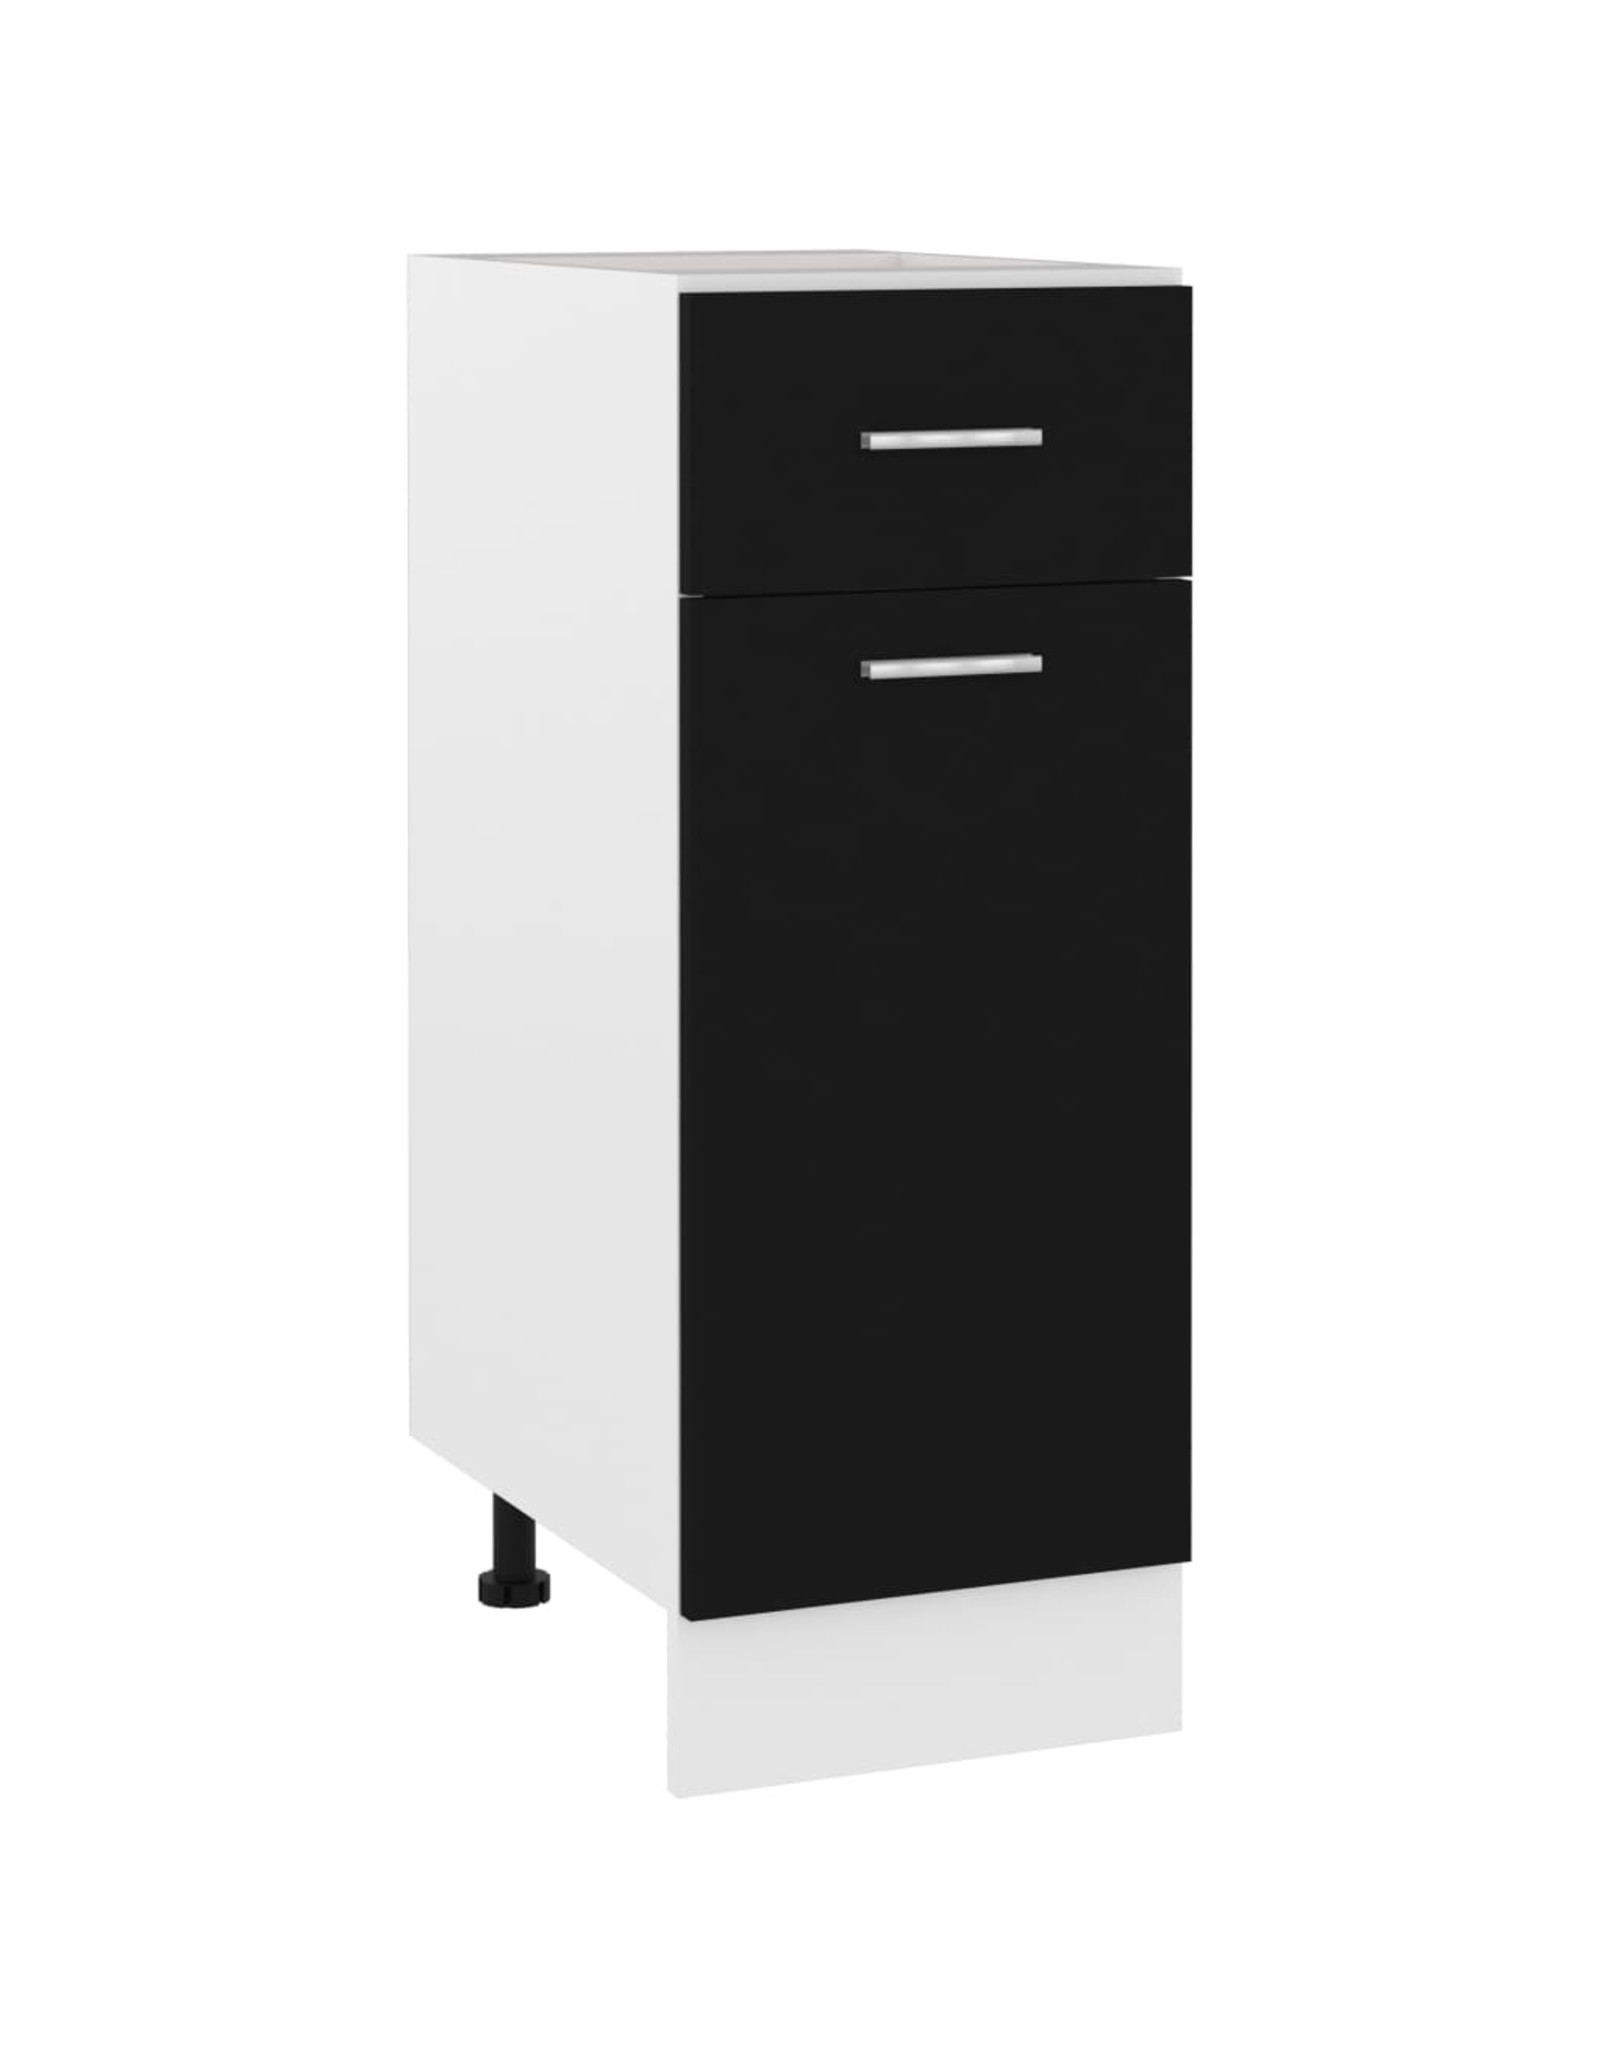 Onderkast met lade 30x46x81,5 cm spaanplaat zwart